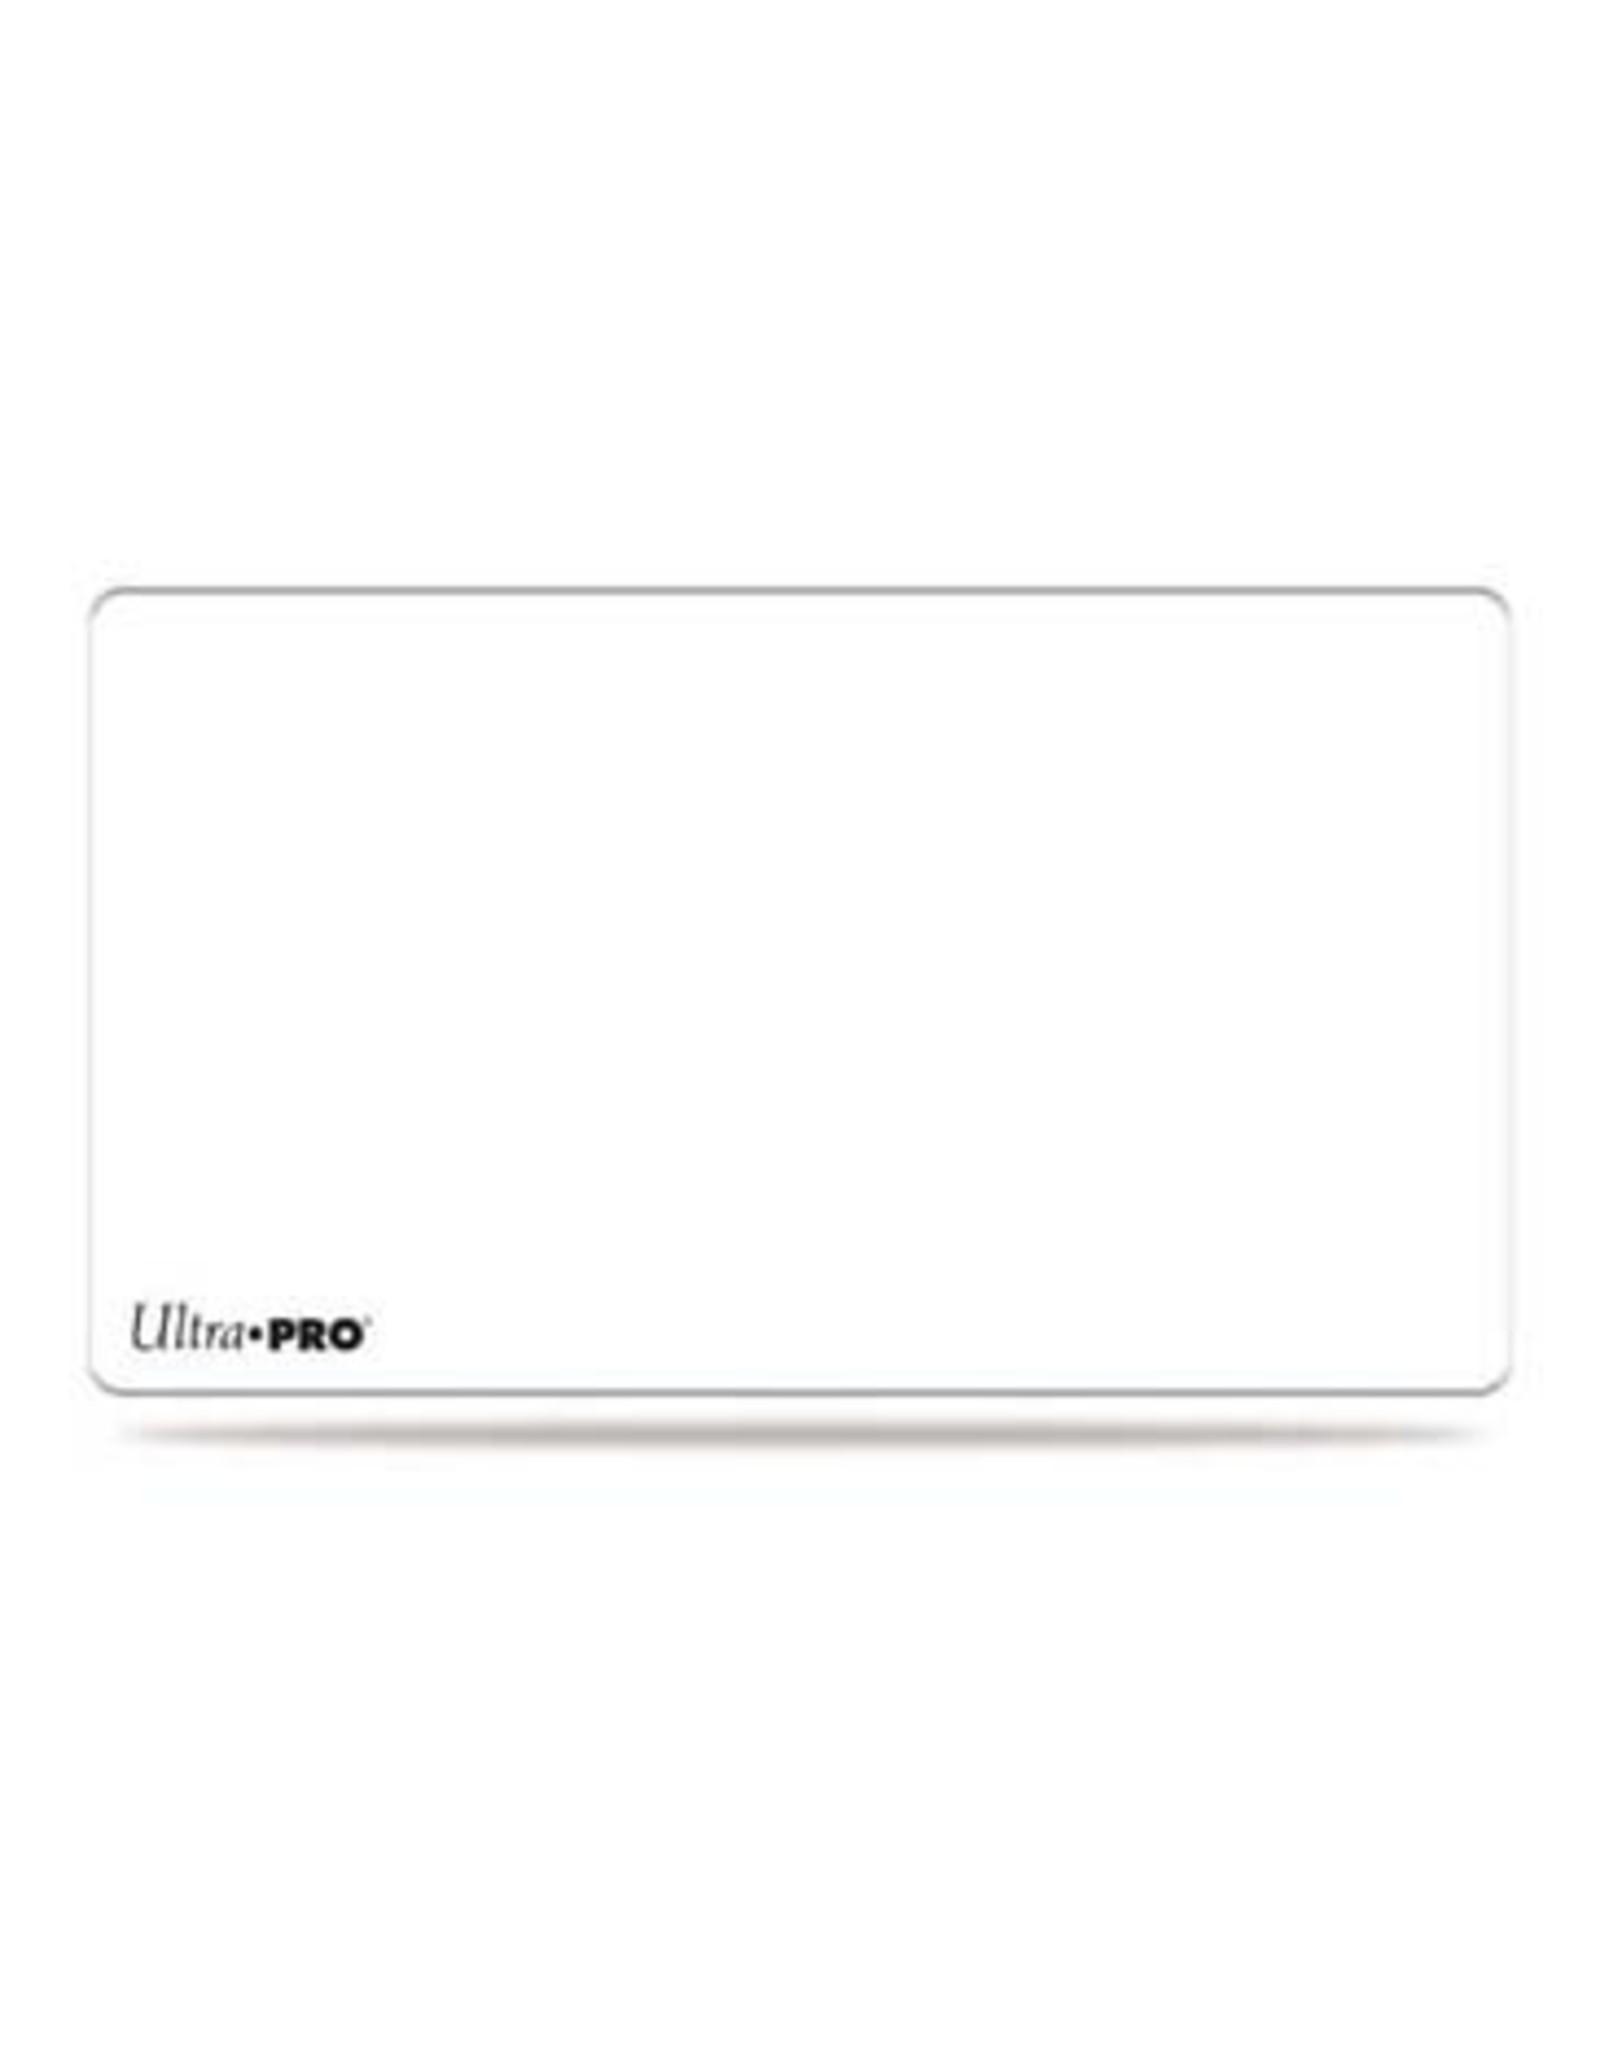 Ultra Pro Ultra Pro Artist Playmat: Solid White